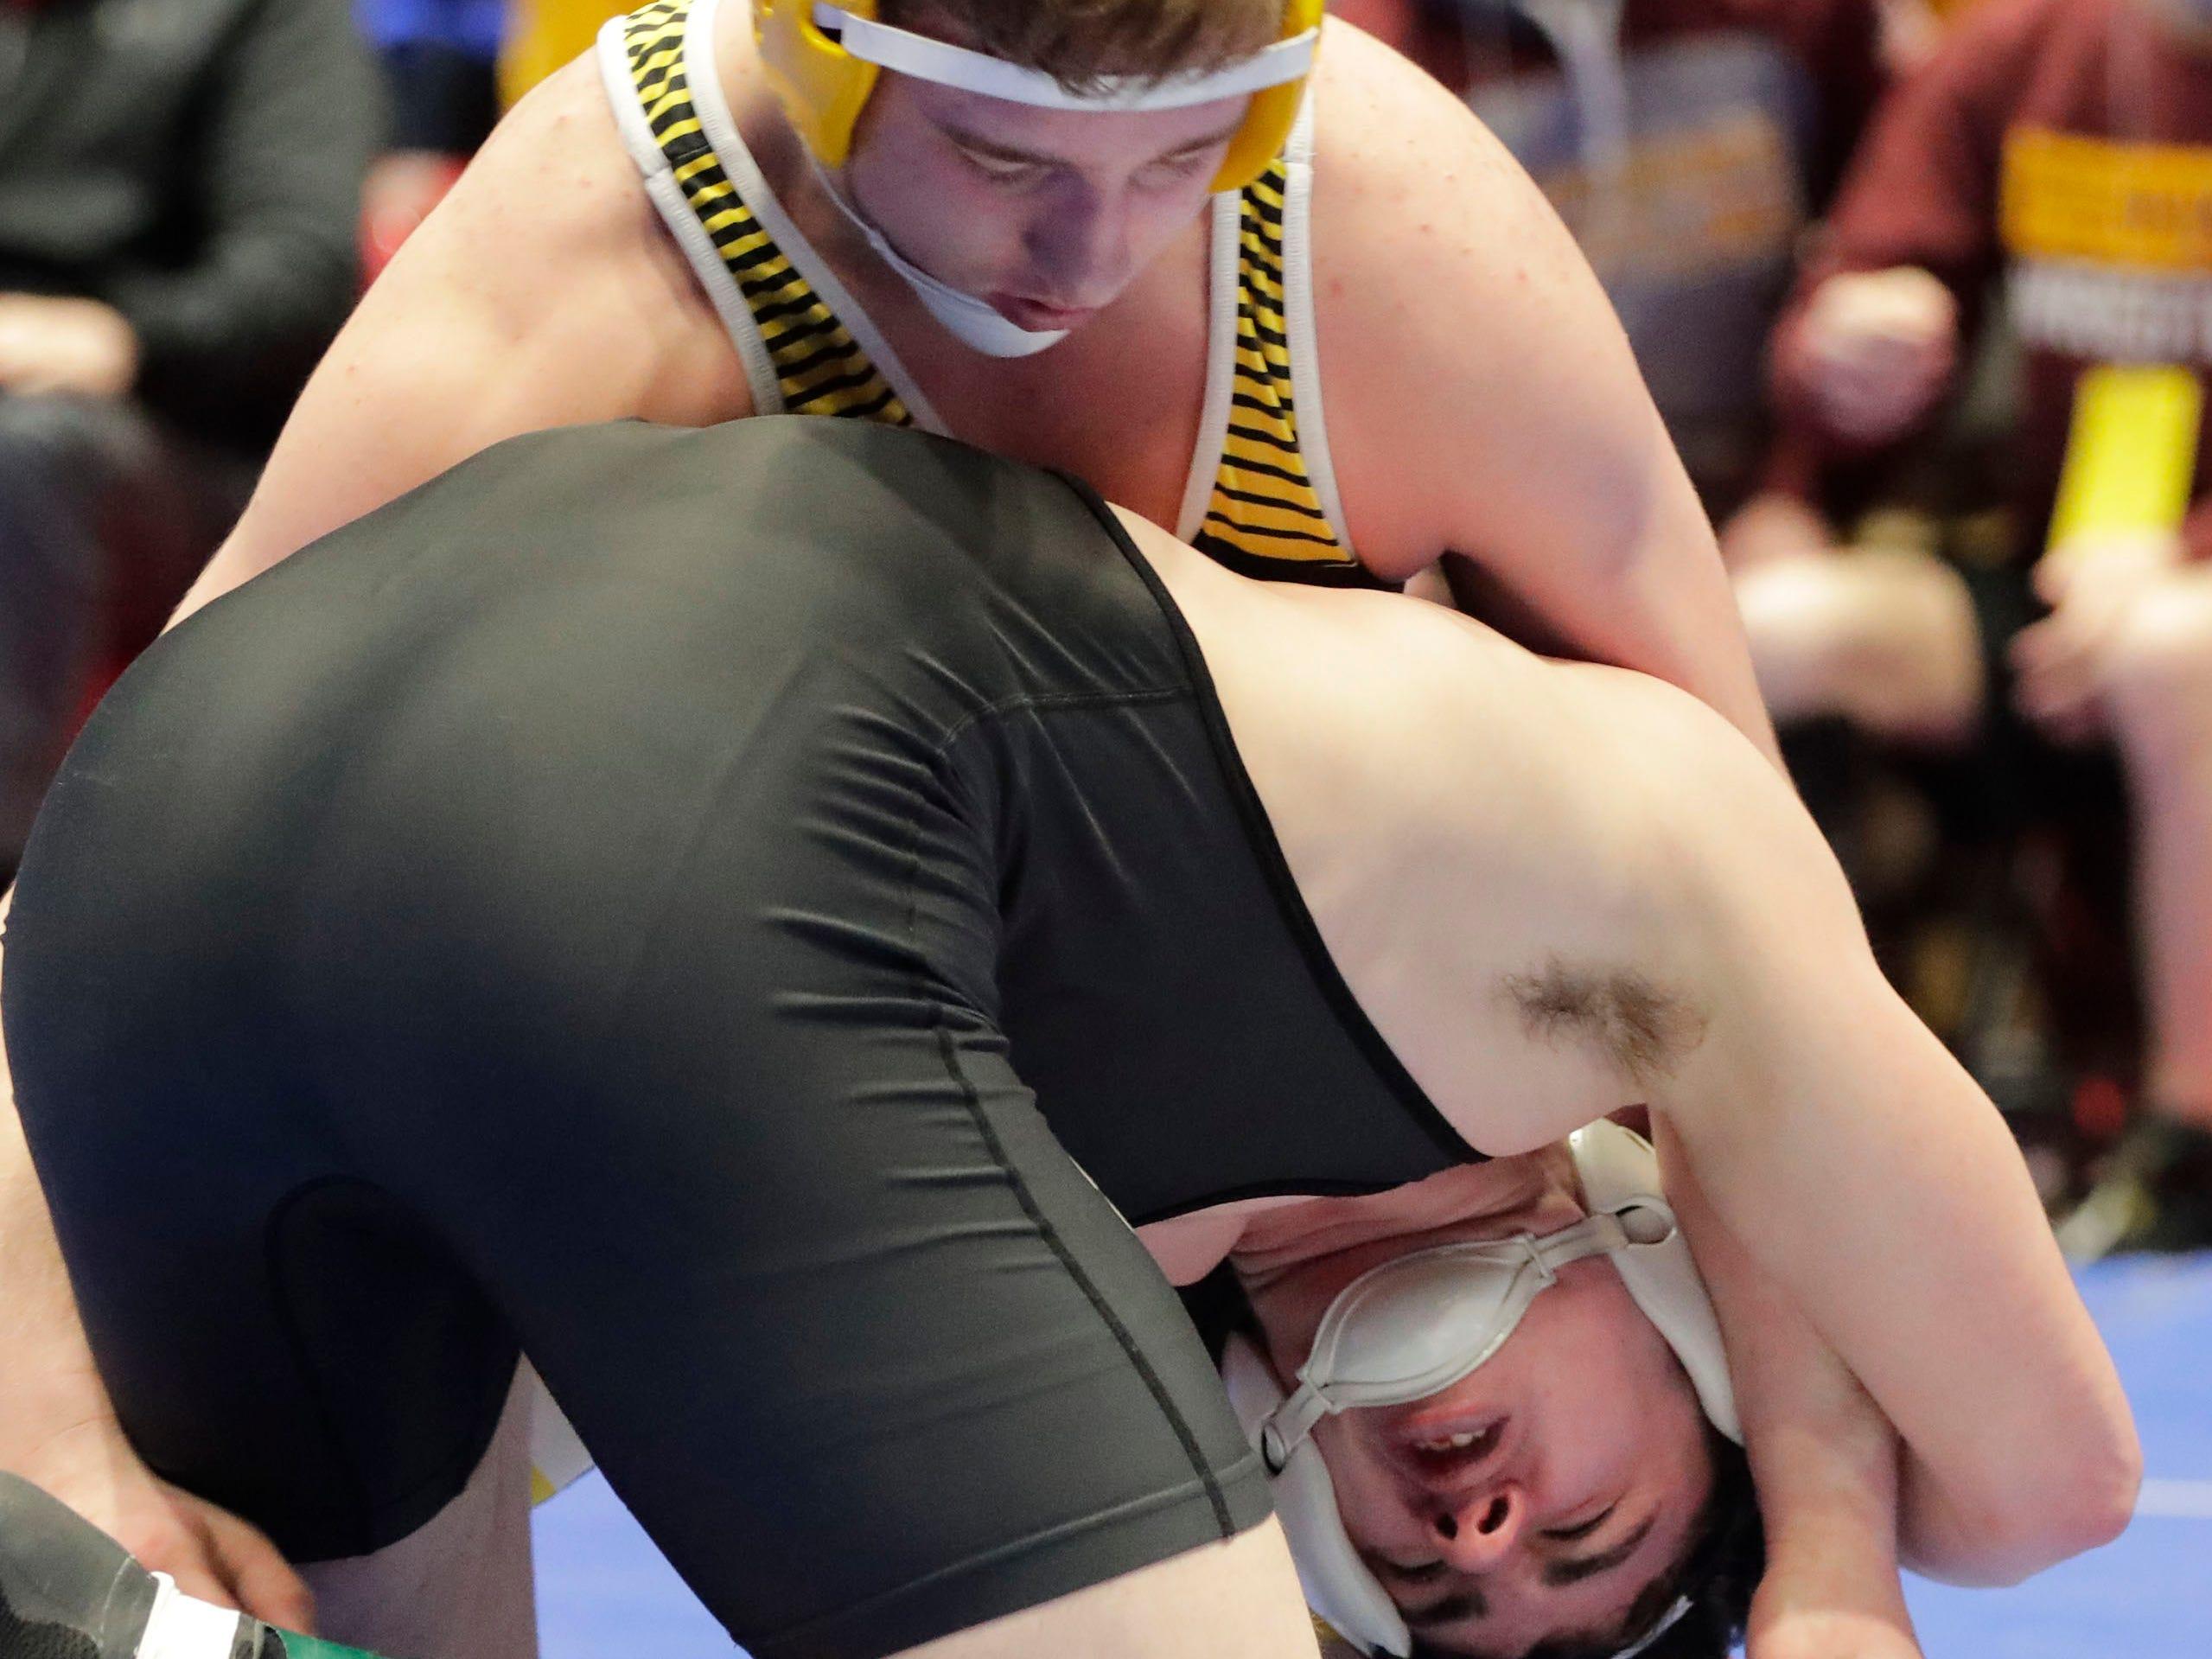 Stratford's Jediah Knetter, bottom, wrestles Fennimore's Logan Klass in the 195-pound class, Saturday, March 2, 2019, in Madison, Wis.